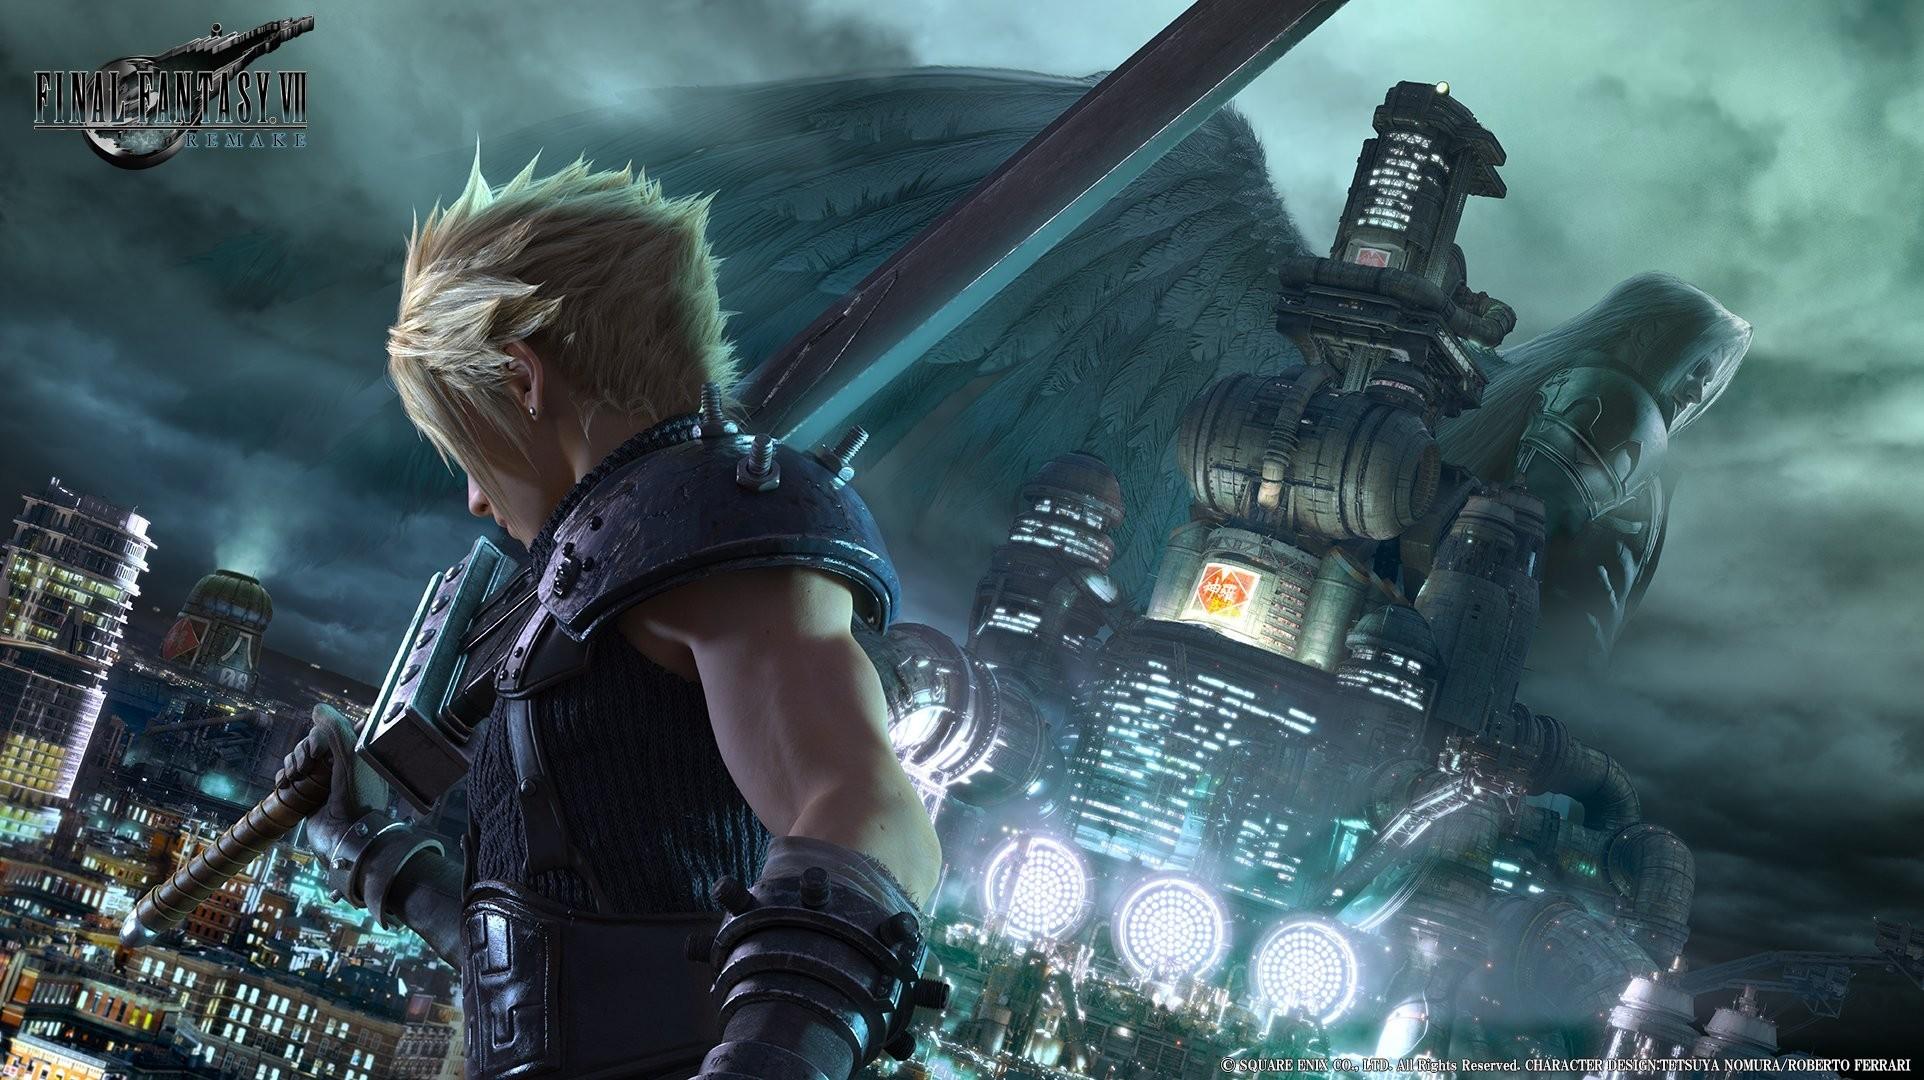 Cloud Strife, Final Fantasy VII, Video games, Midgar, Shinra, Sephiroth Wallpapers  HD / Desktop and Mobile Backgrounds